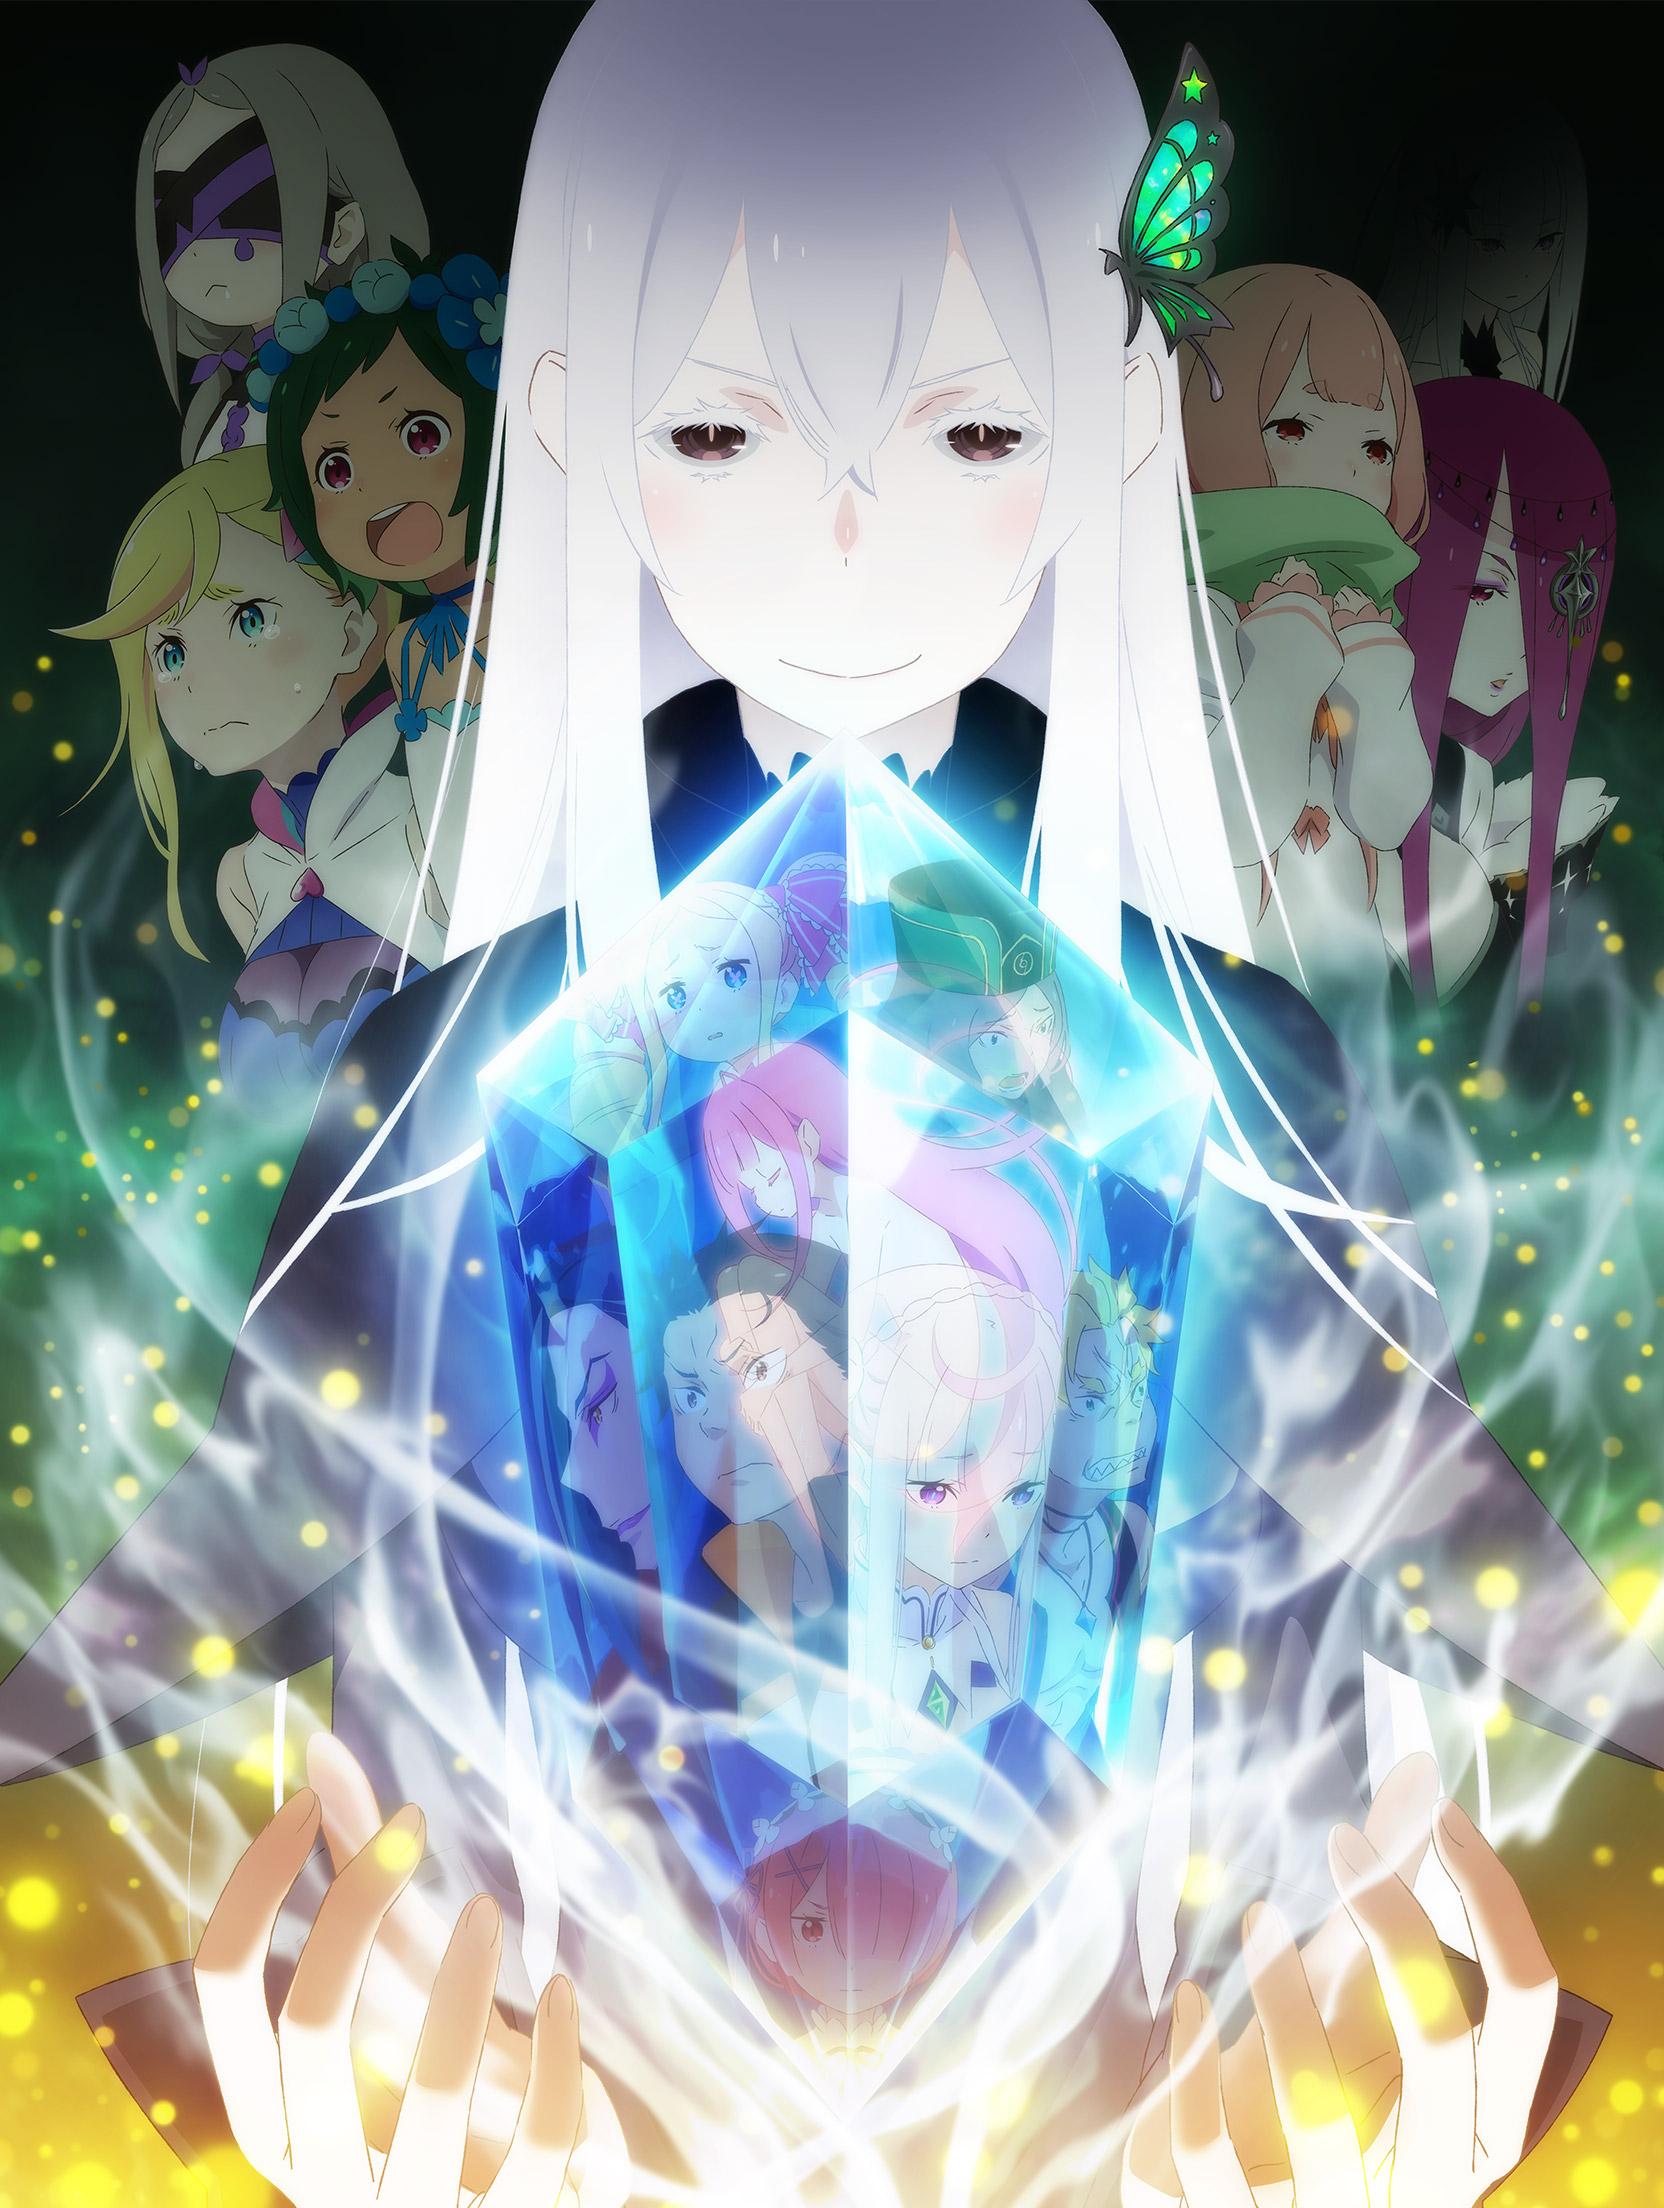 『Re:ゼロから始める異世界生活』2nd season前回の第1話のあらすじと振り返り